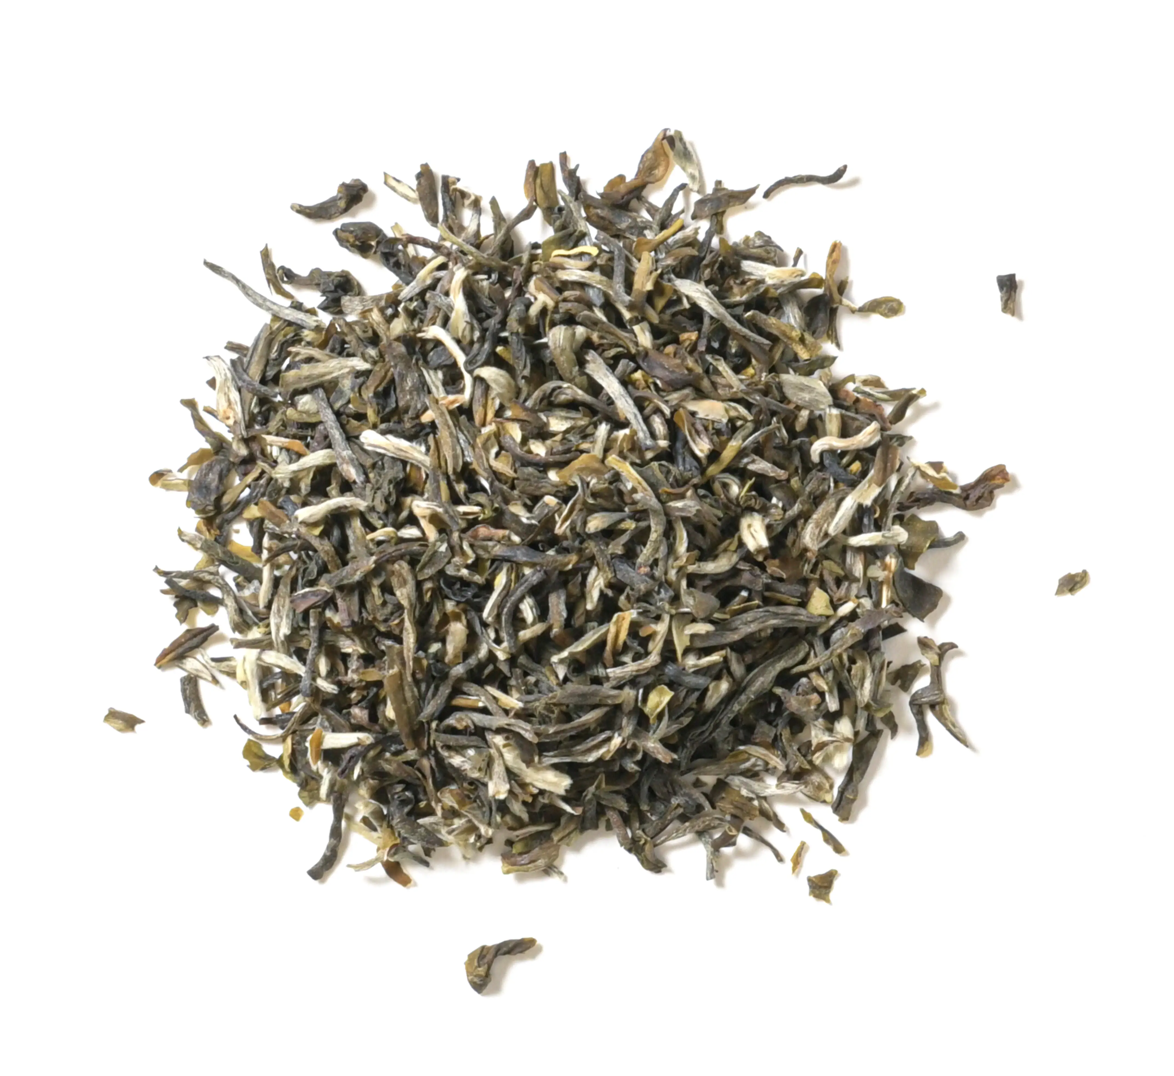 Apolis Tea, Jasmine Silver Tip, 12 bags